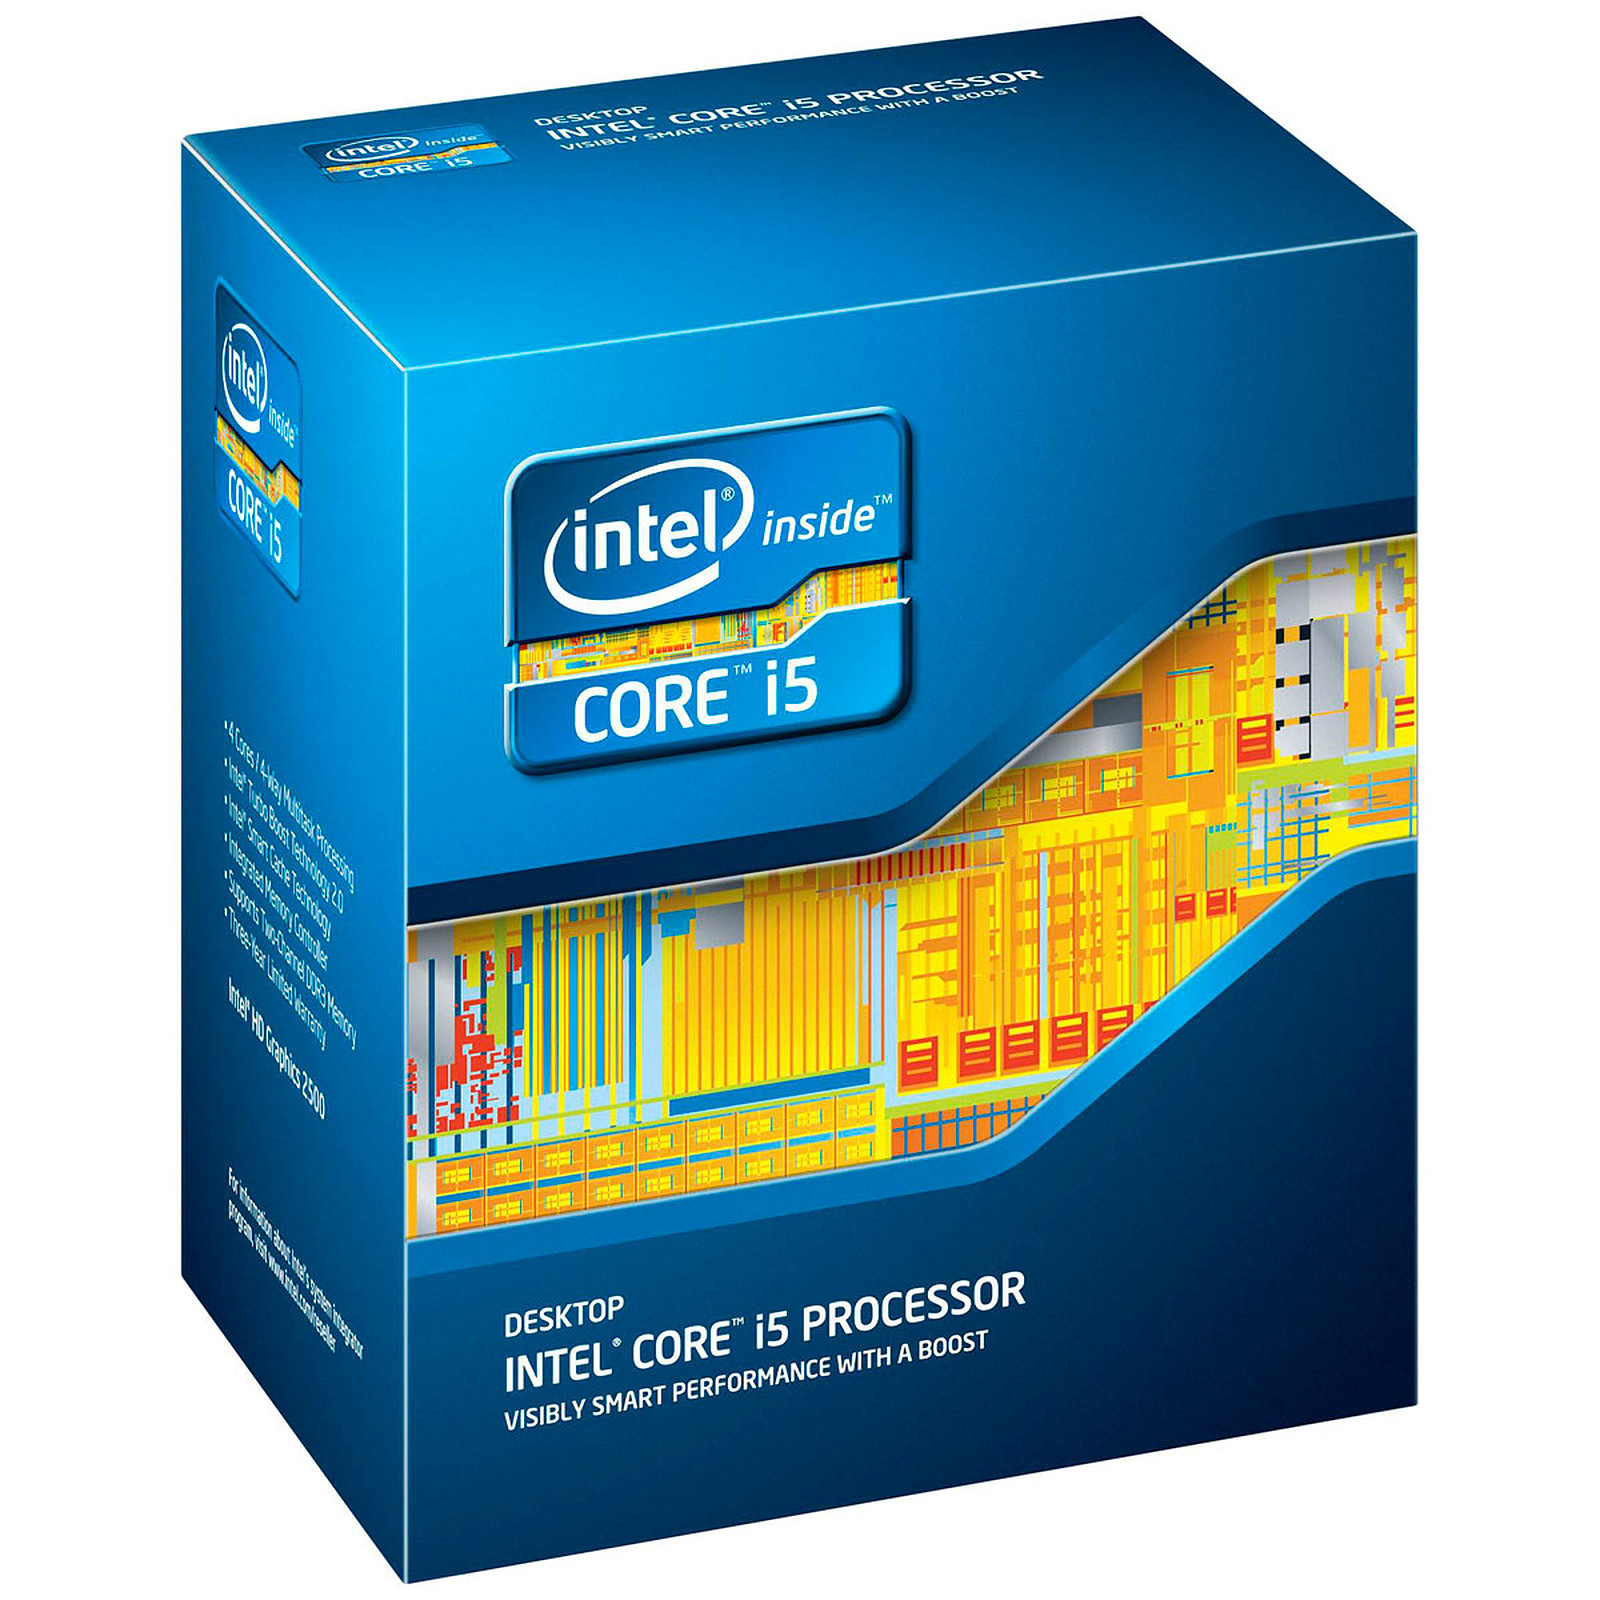 Intel Core i5-3330 (3.0 GHz)